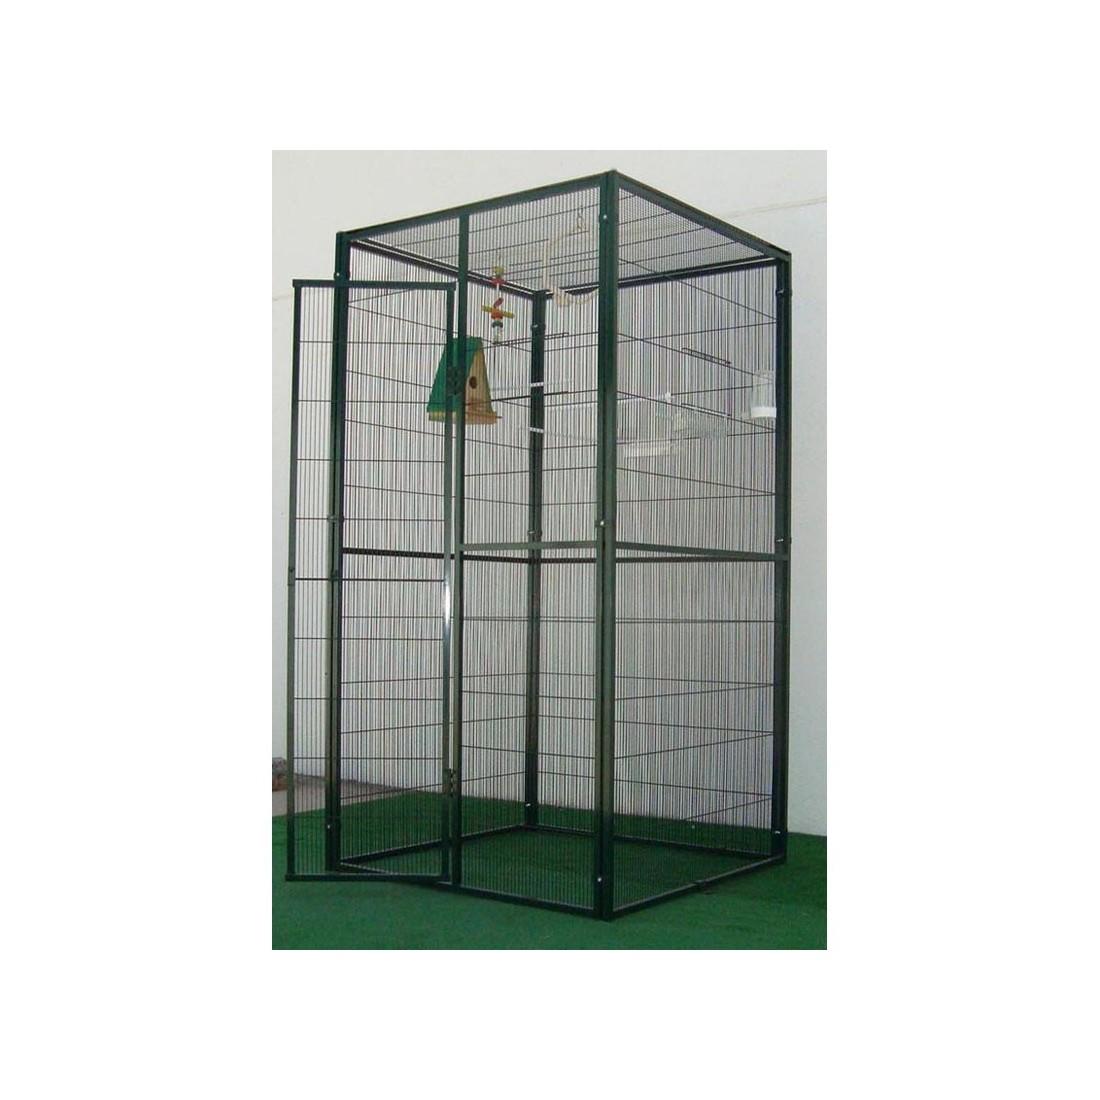 VOLADERO INTERIOR DE 1 m2